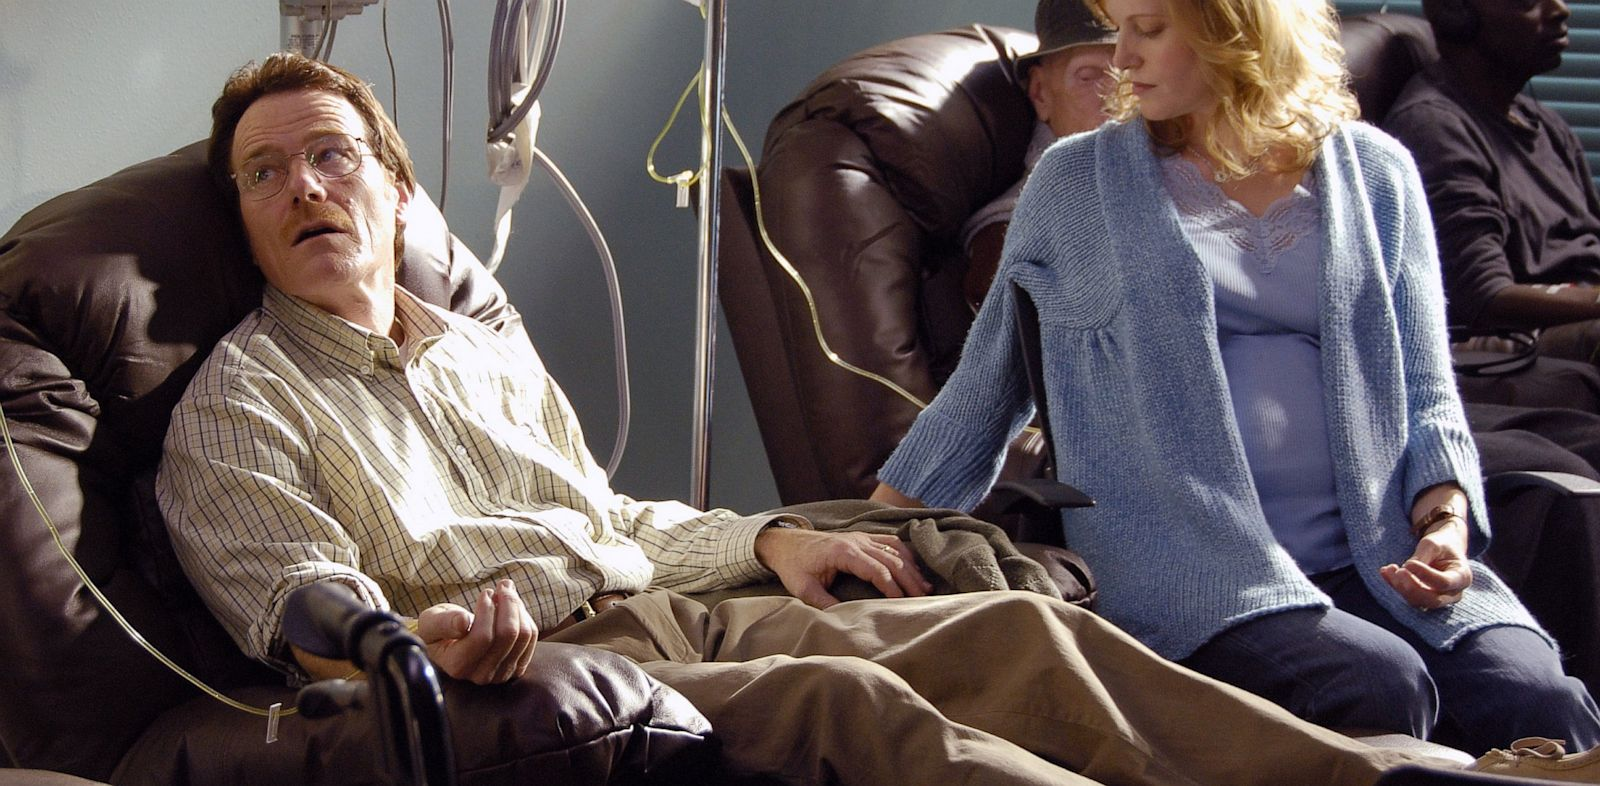 PHOTO: Bryan Cranston and Anna Gunn in Breaking Bad